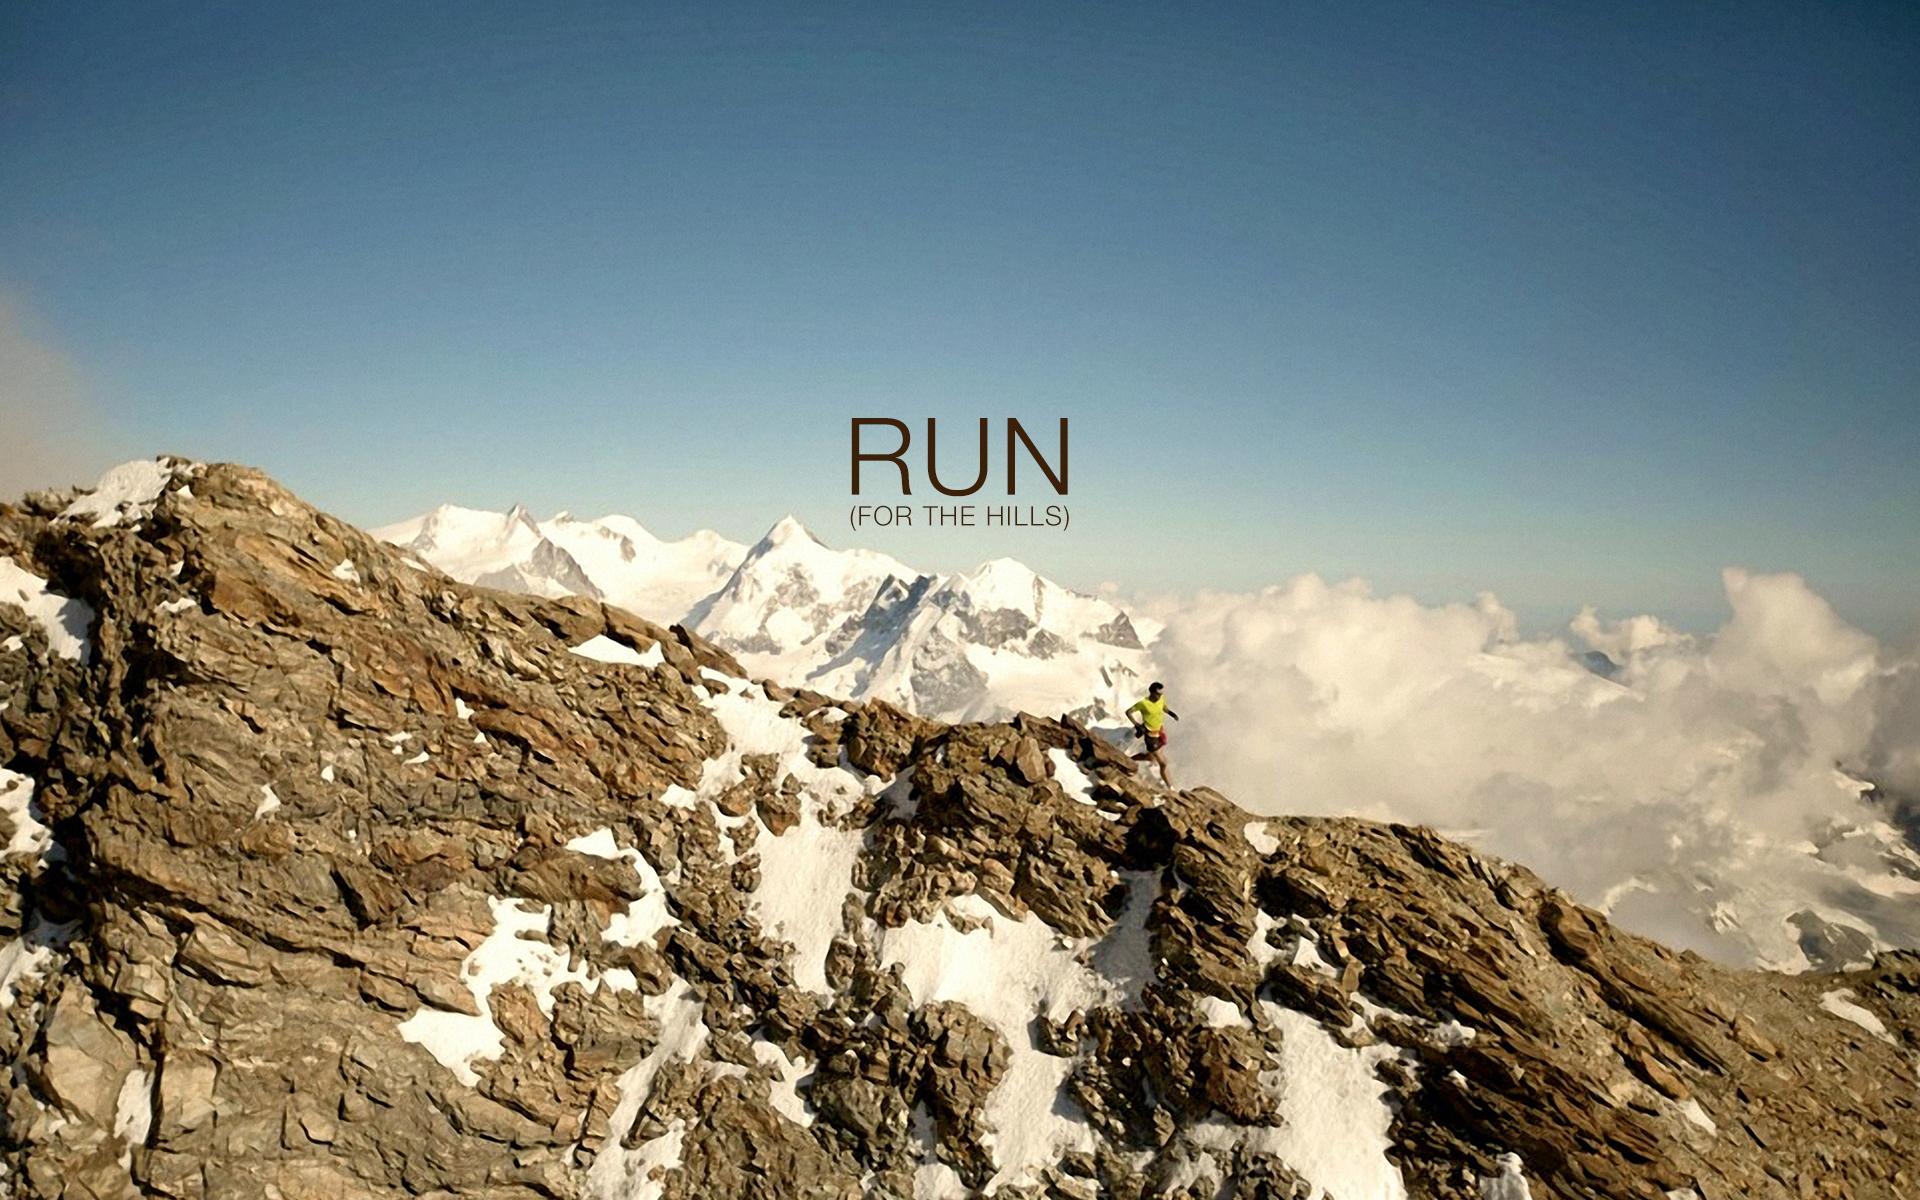 Nike Running Wallpaper Iphone Run for the hills 1610 1920x1200